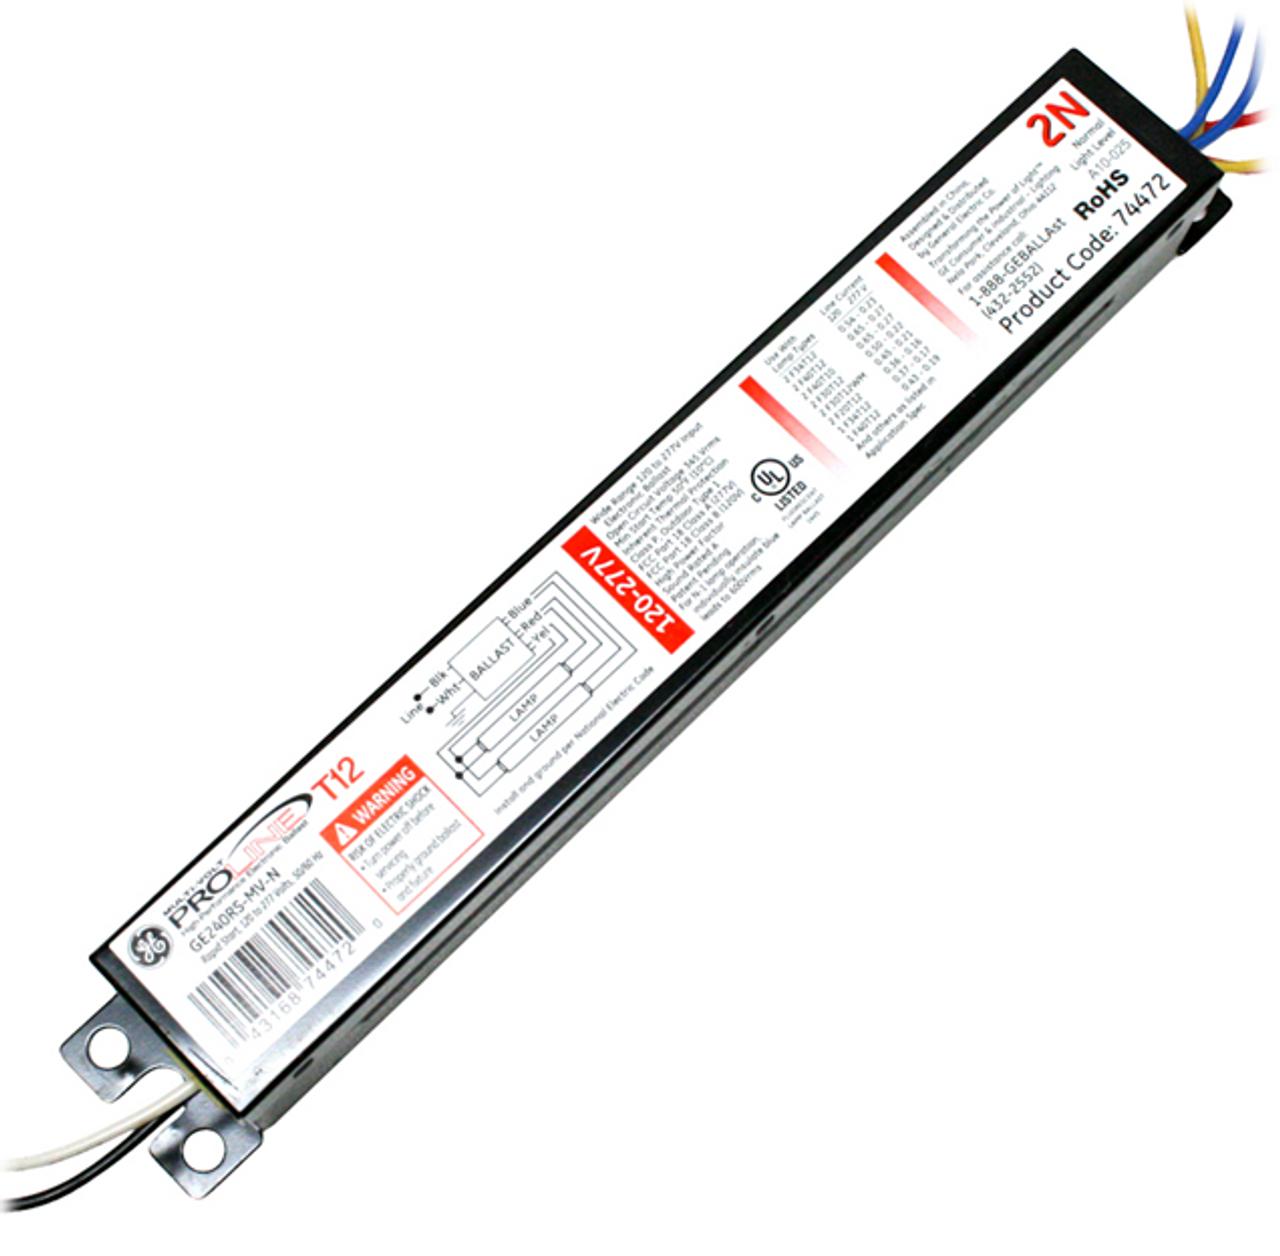 Ge240psmvn 74472 Ge Multivolt Proline Electronic Ballast. Ballast Ge240psmvn 74472 Ge. Wiring. General Electric Ballast Wiring Diagram 240 At Scoala.co